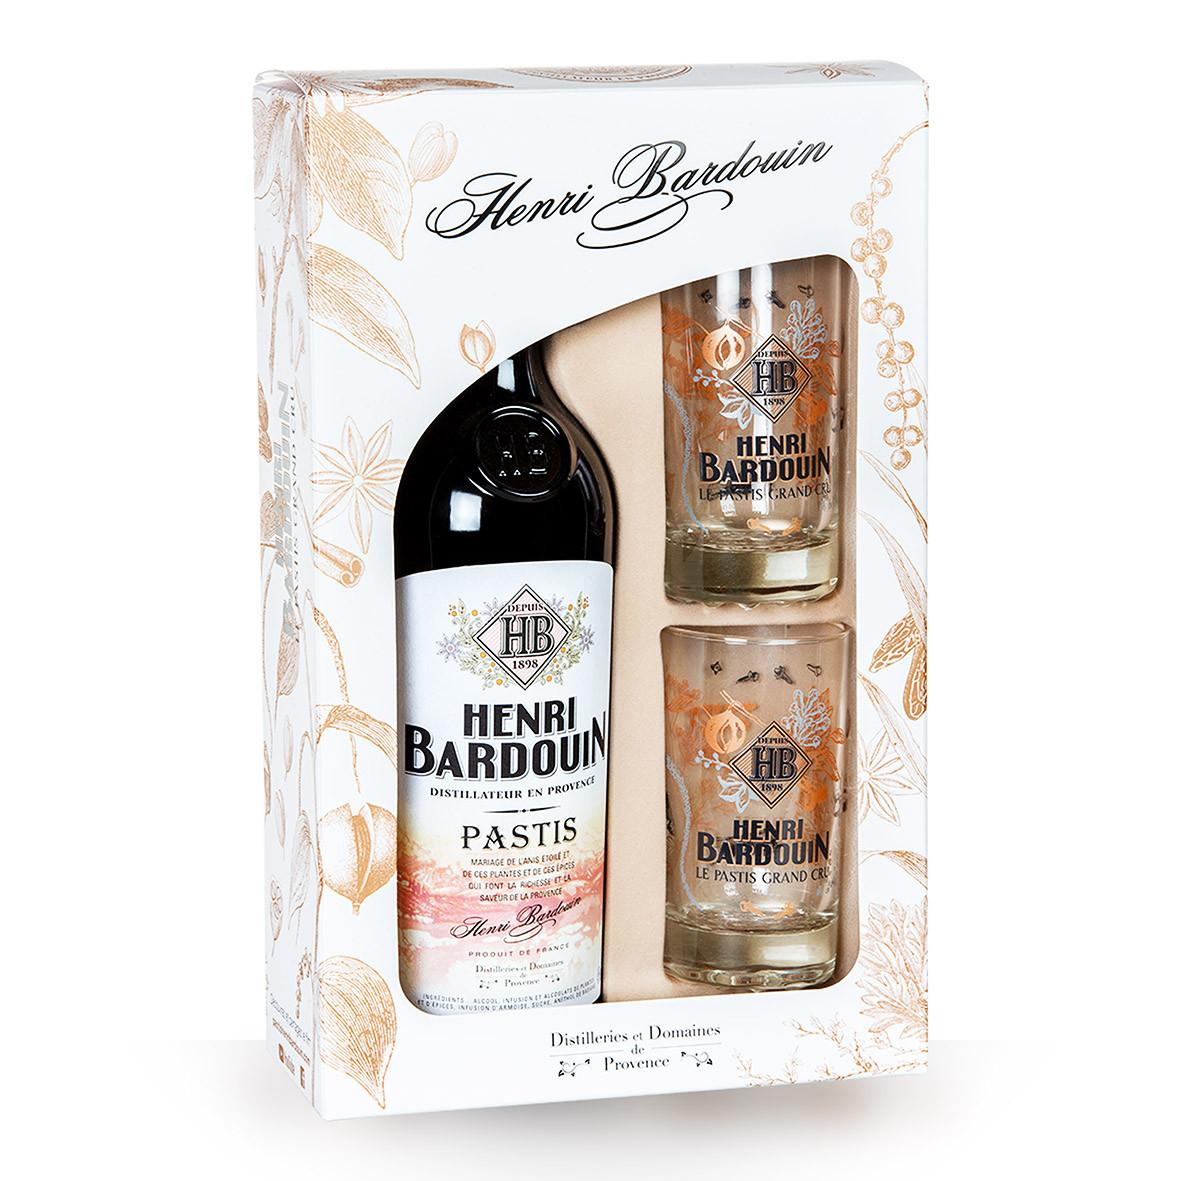 Henri Bardouin 70cl Coffret 2 verres www.odyssee-vins.com